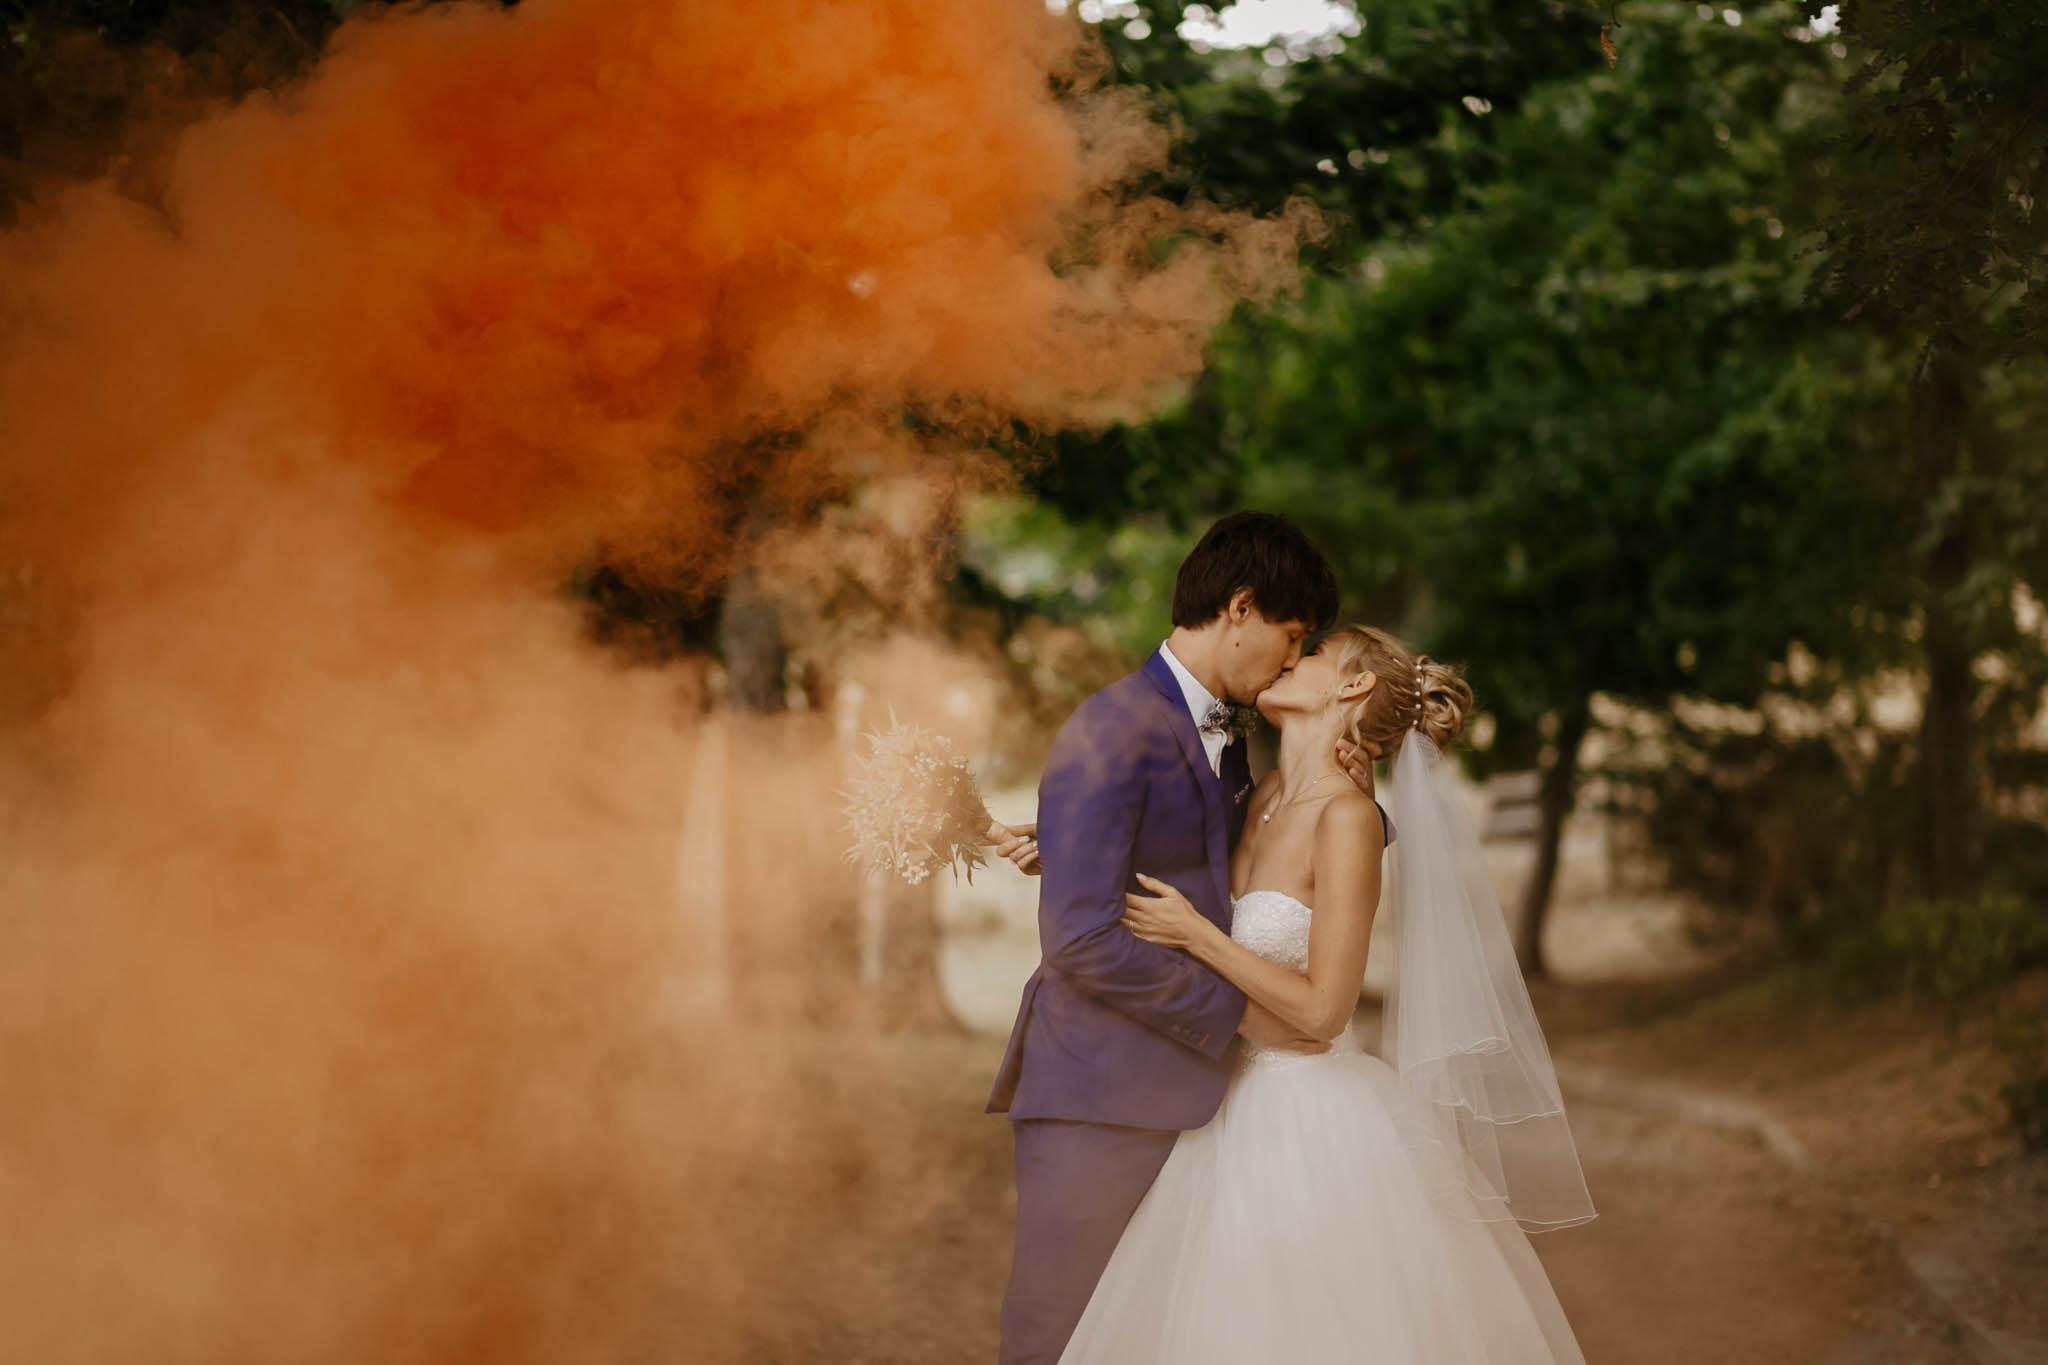 mariage-chateau-gaudras-ingold-74.jpg